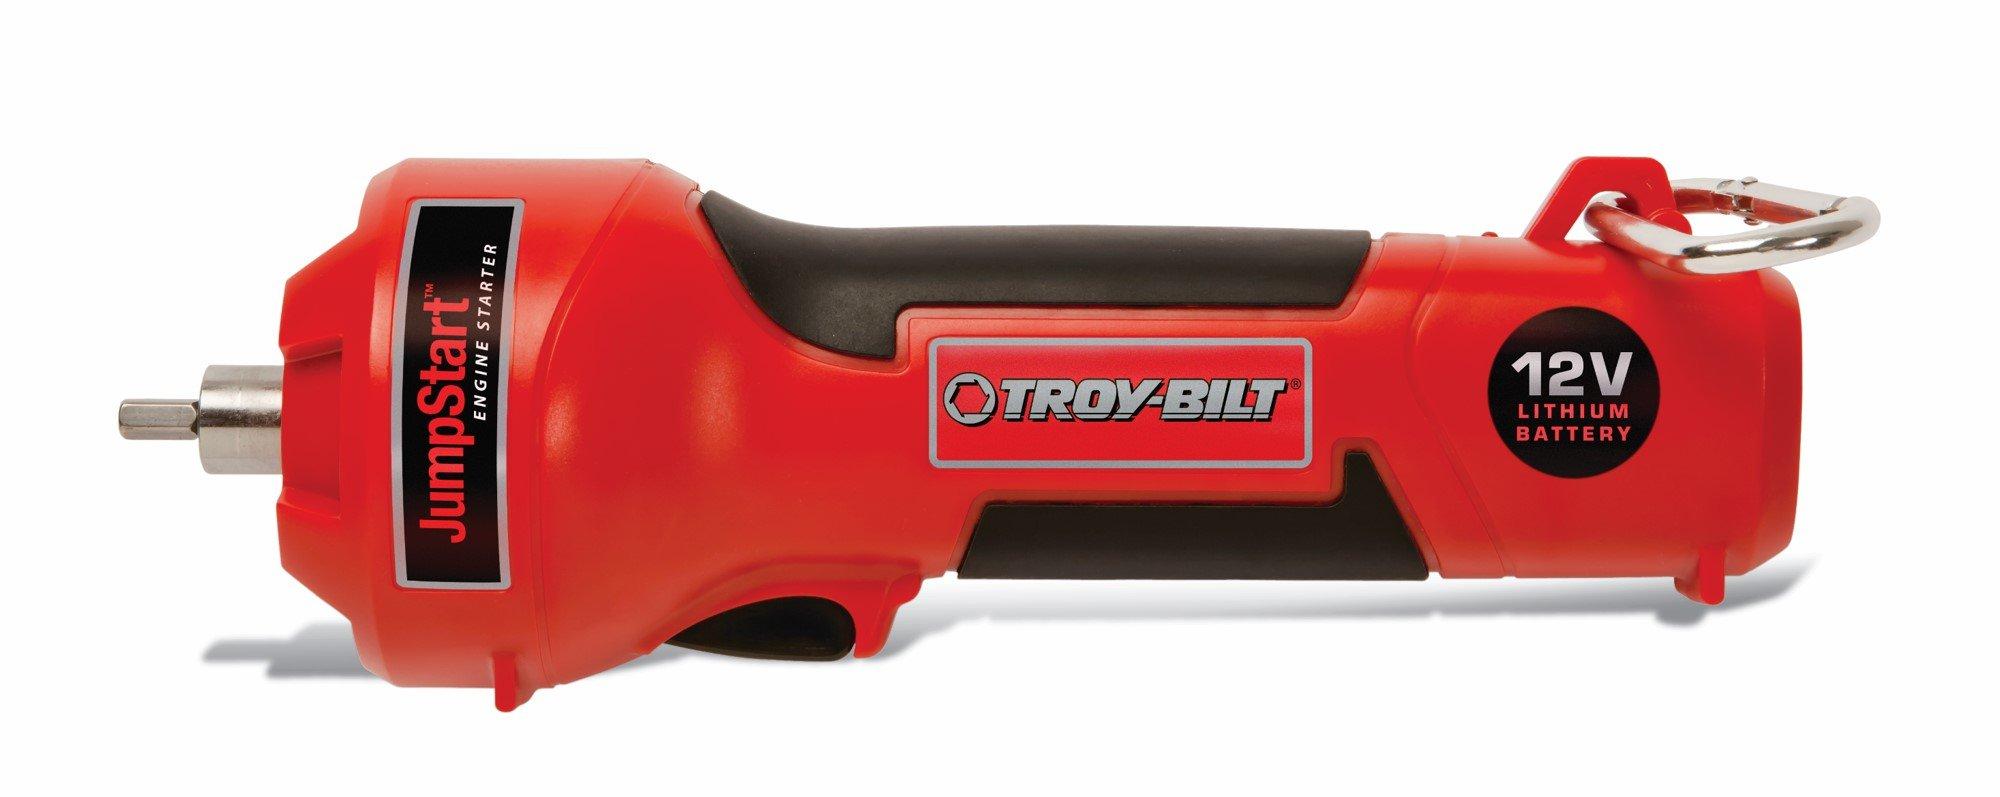 Troy-Bilt Cordless Trimmer JumpStart Engine Starter by Troy-Bilt